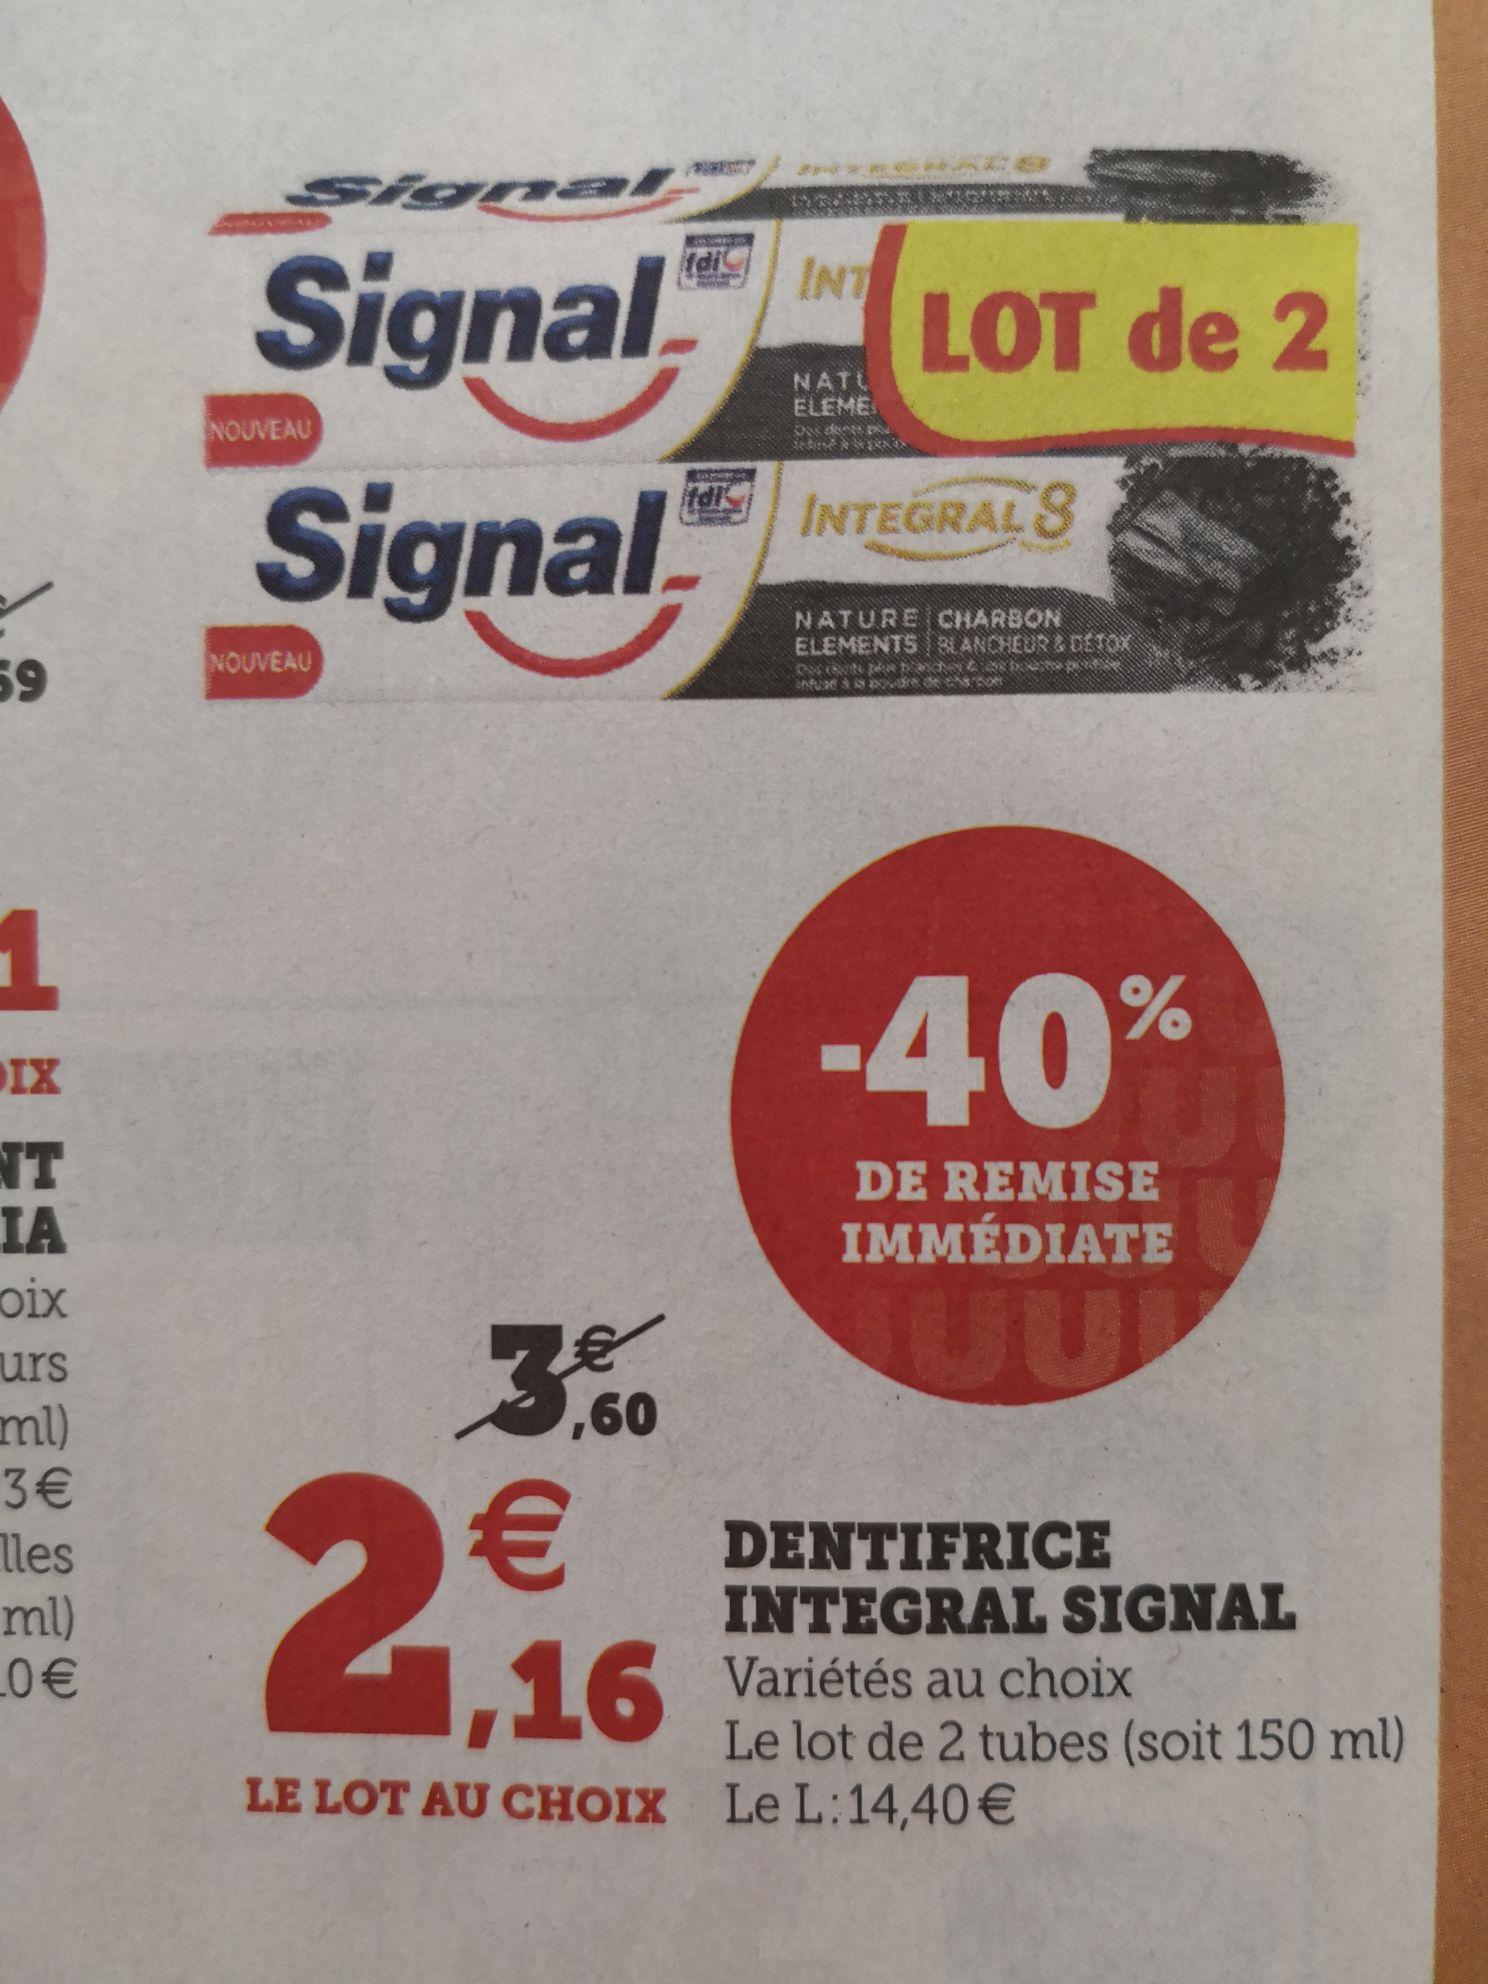 Lot de 2 tubes de dentifrice Signal Integral 8